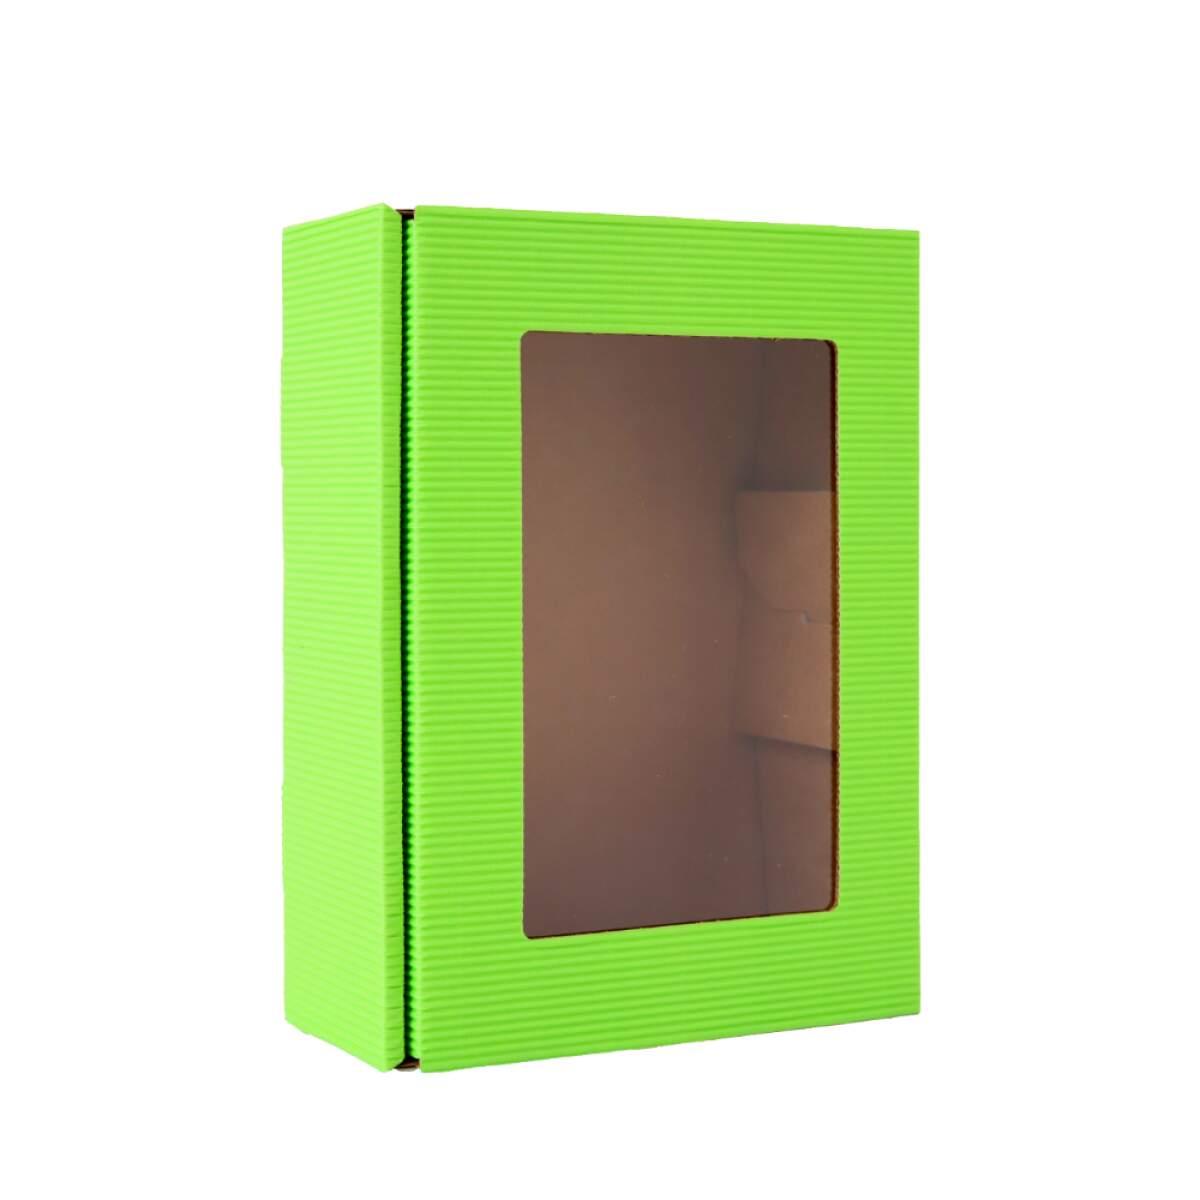 Box-Gr-M-m-Fenster-apfelgr-n_2087_1000px